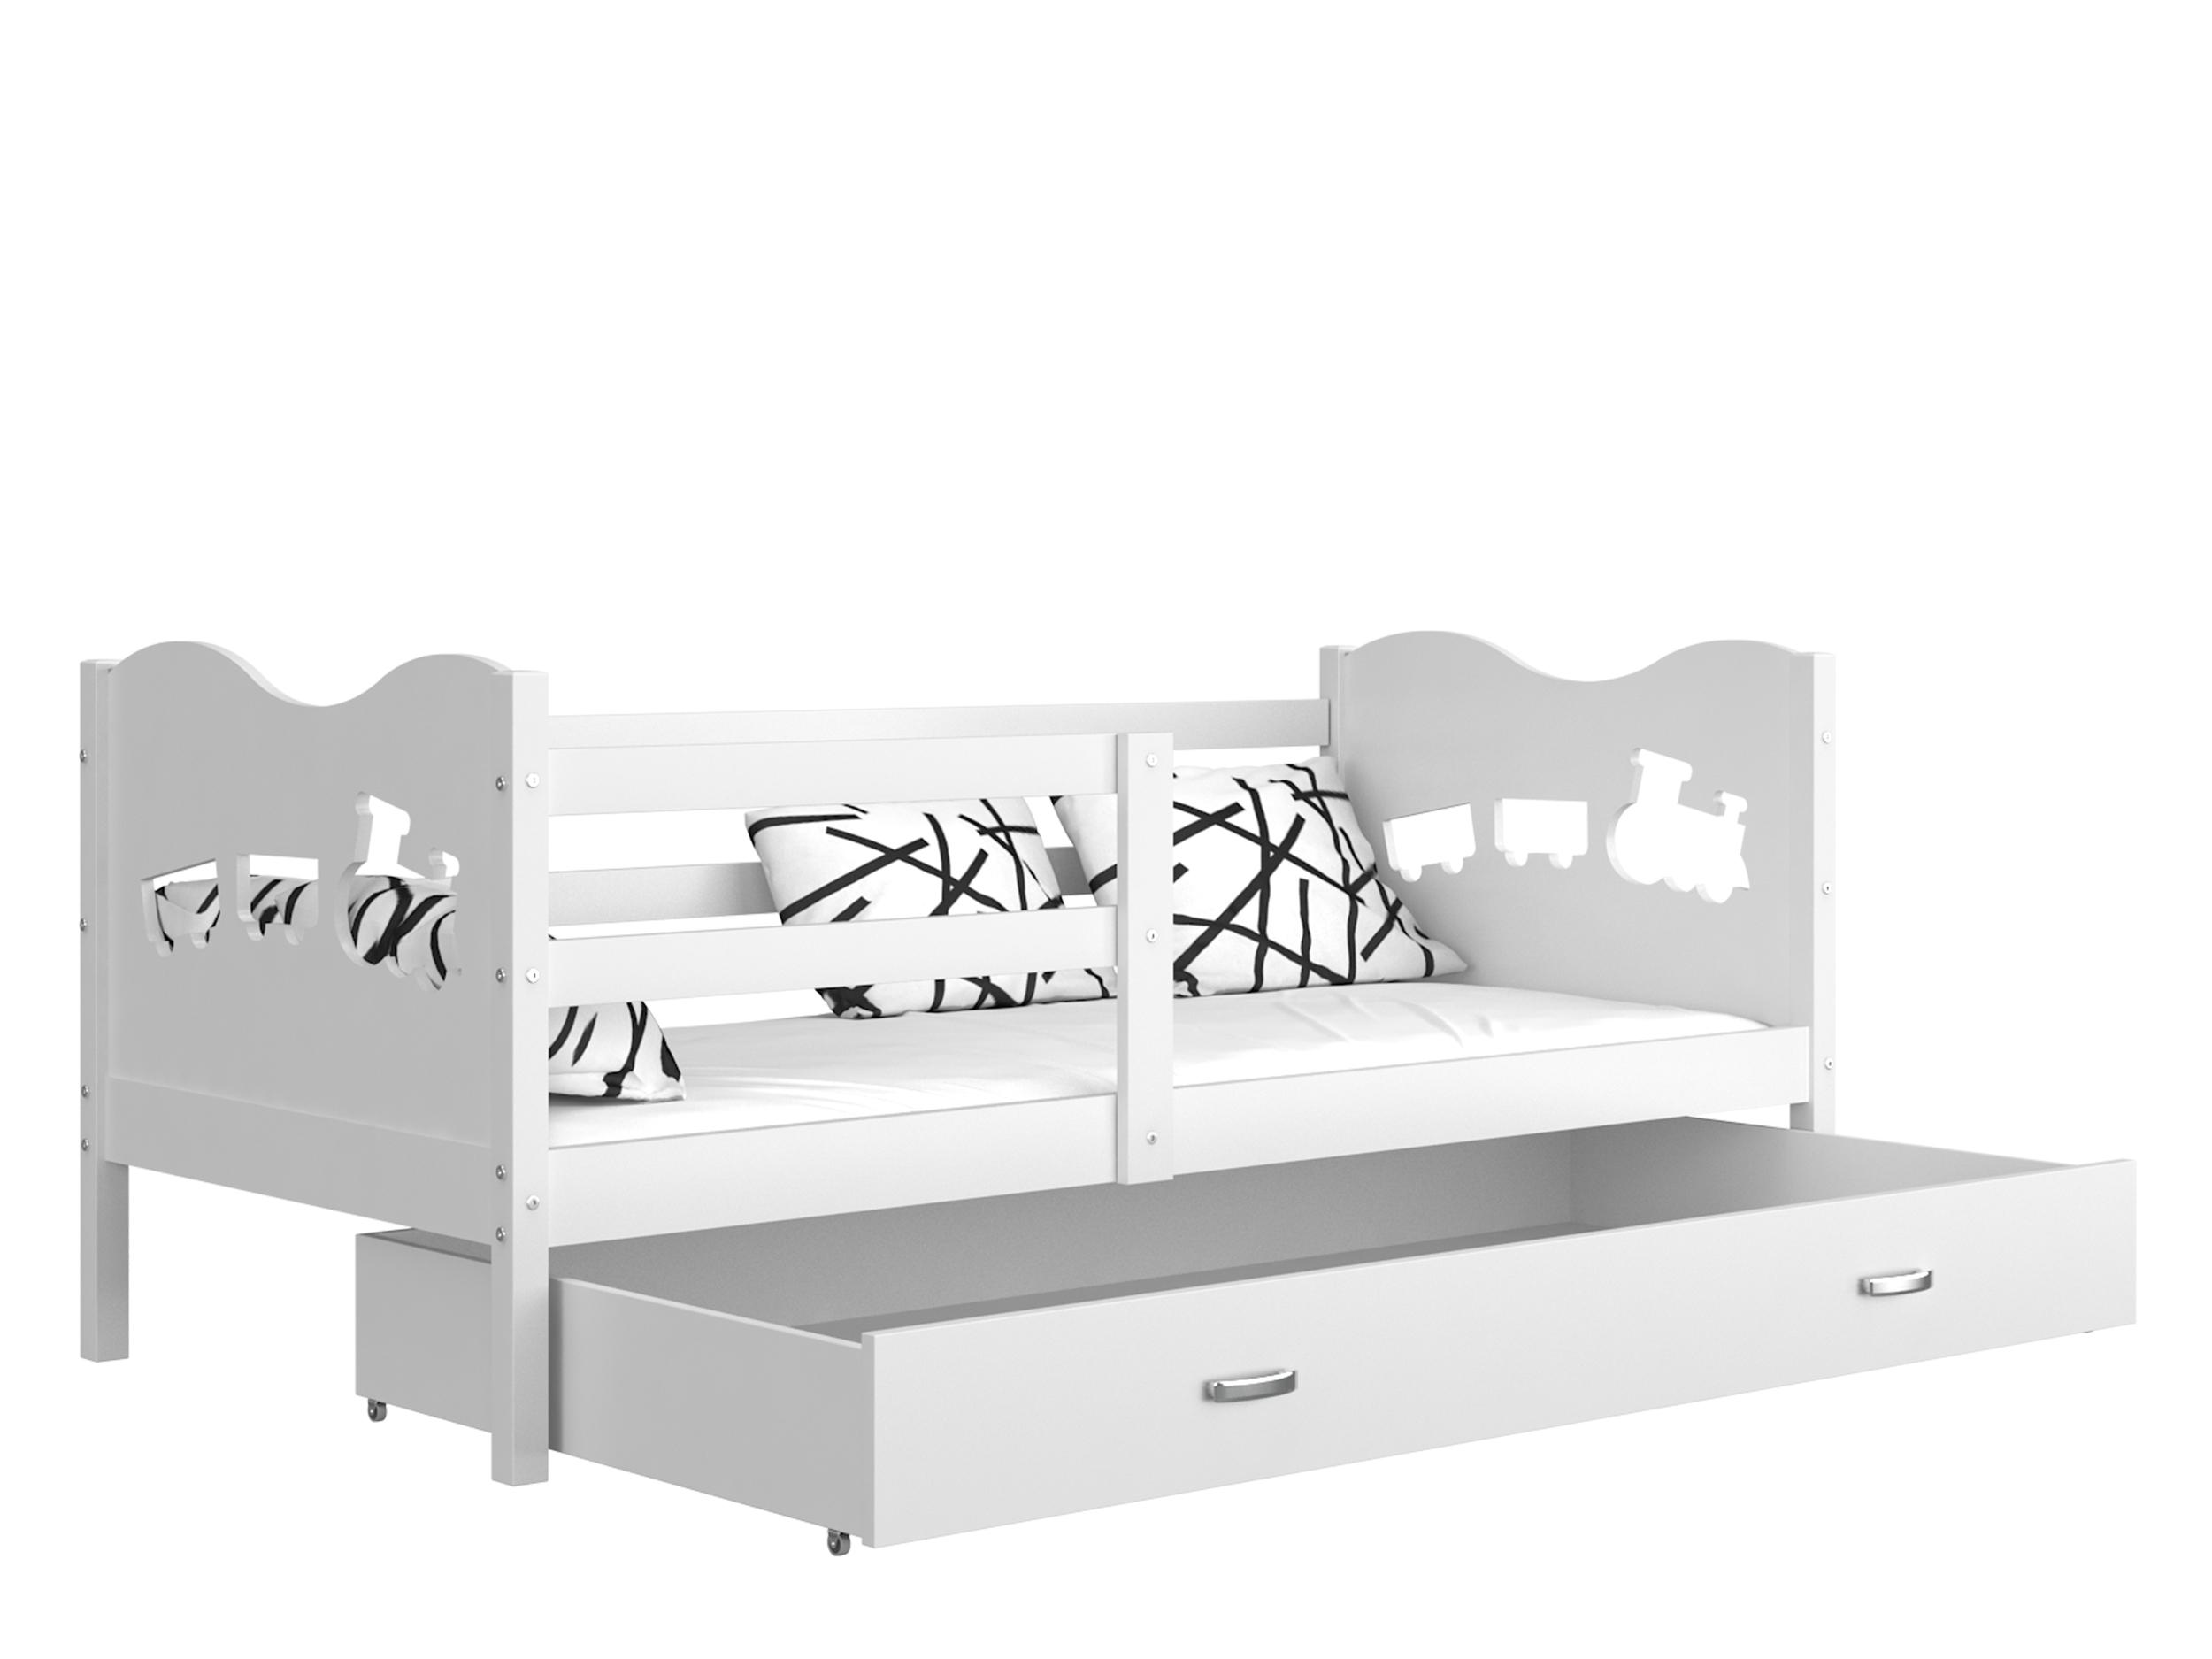 ArtAJ Detská posteľ MAX P / MDF 160 x 80 cm Farba: Biela / biela 160 x 80 cm, s matracom